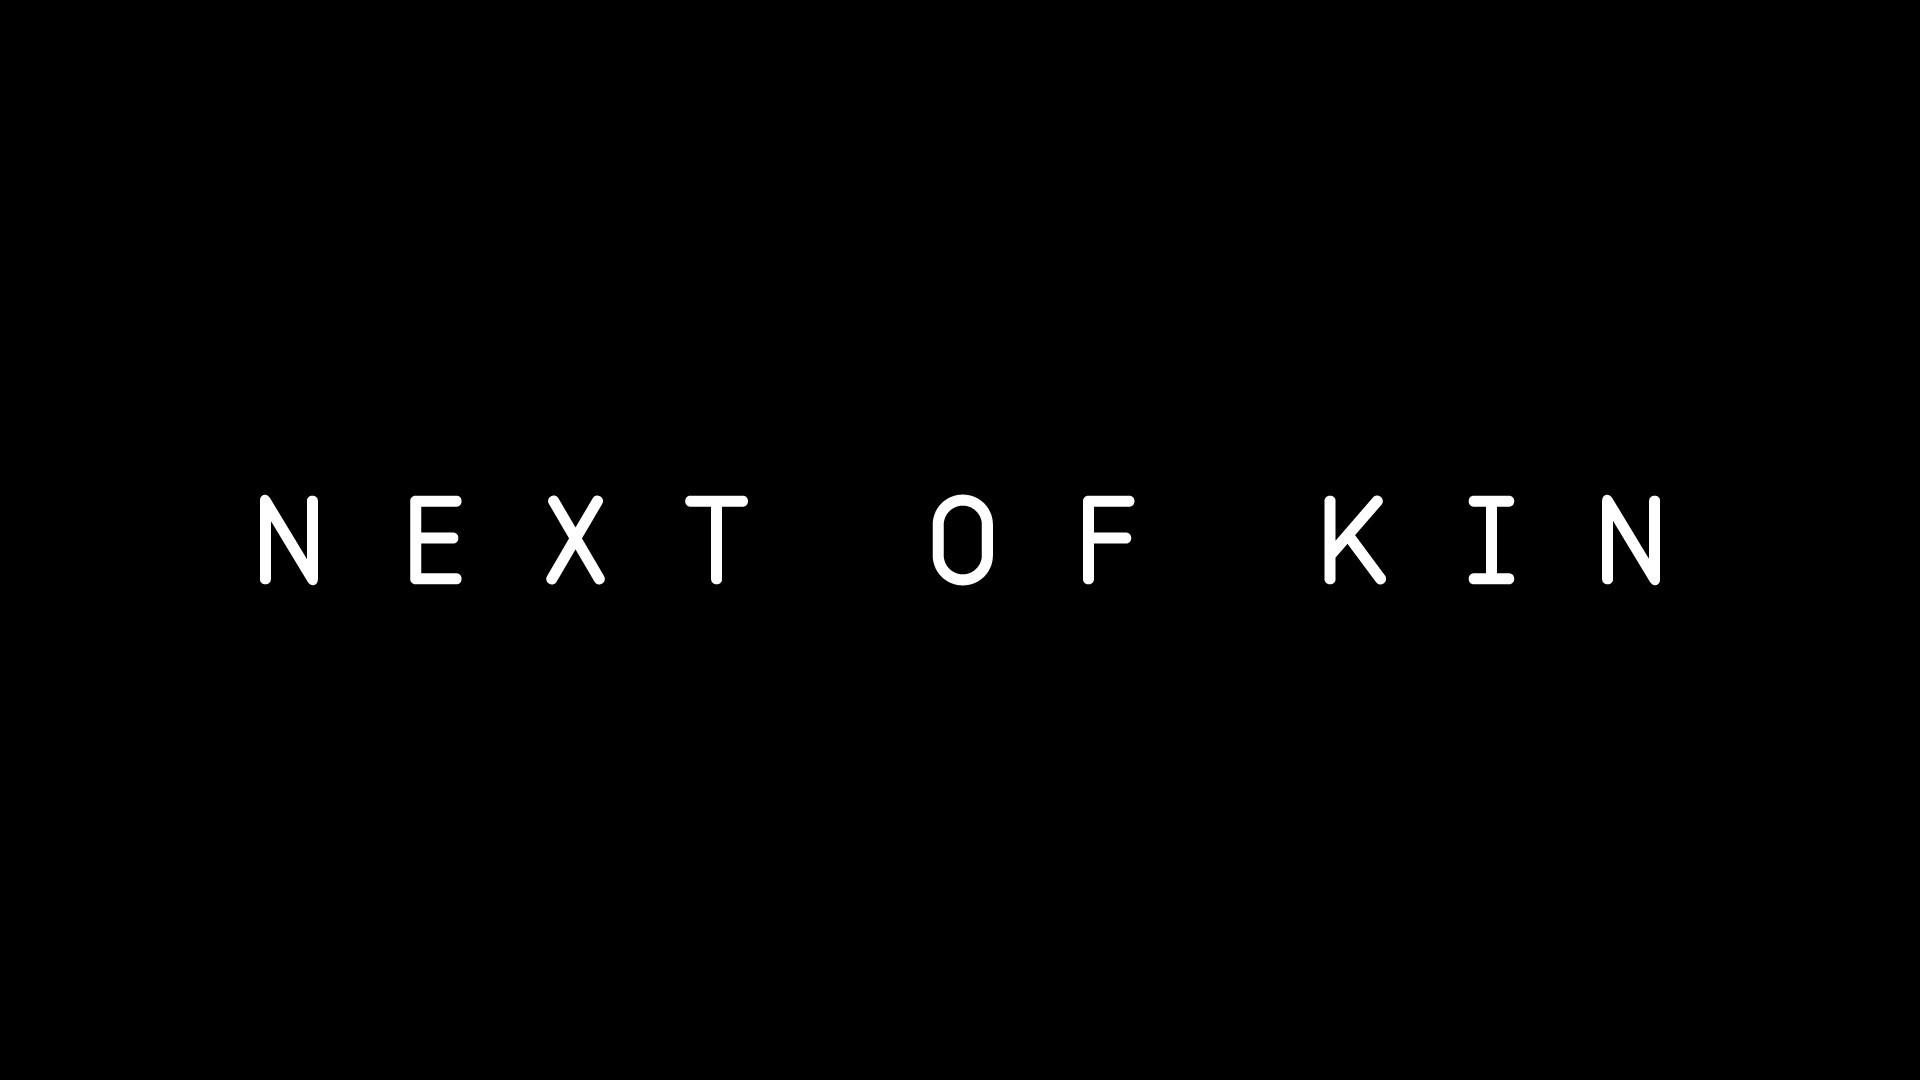 [Watch] Next Of Kin - Full Episode 5 - The ITV Hub